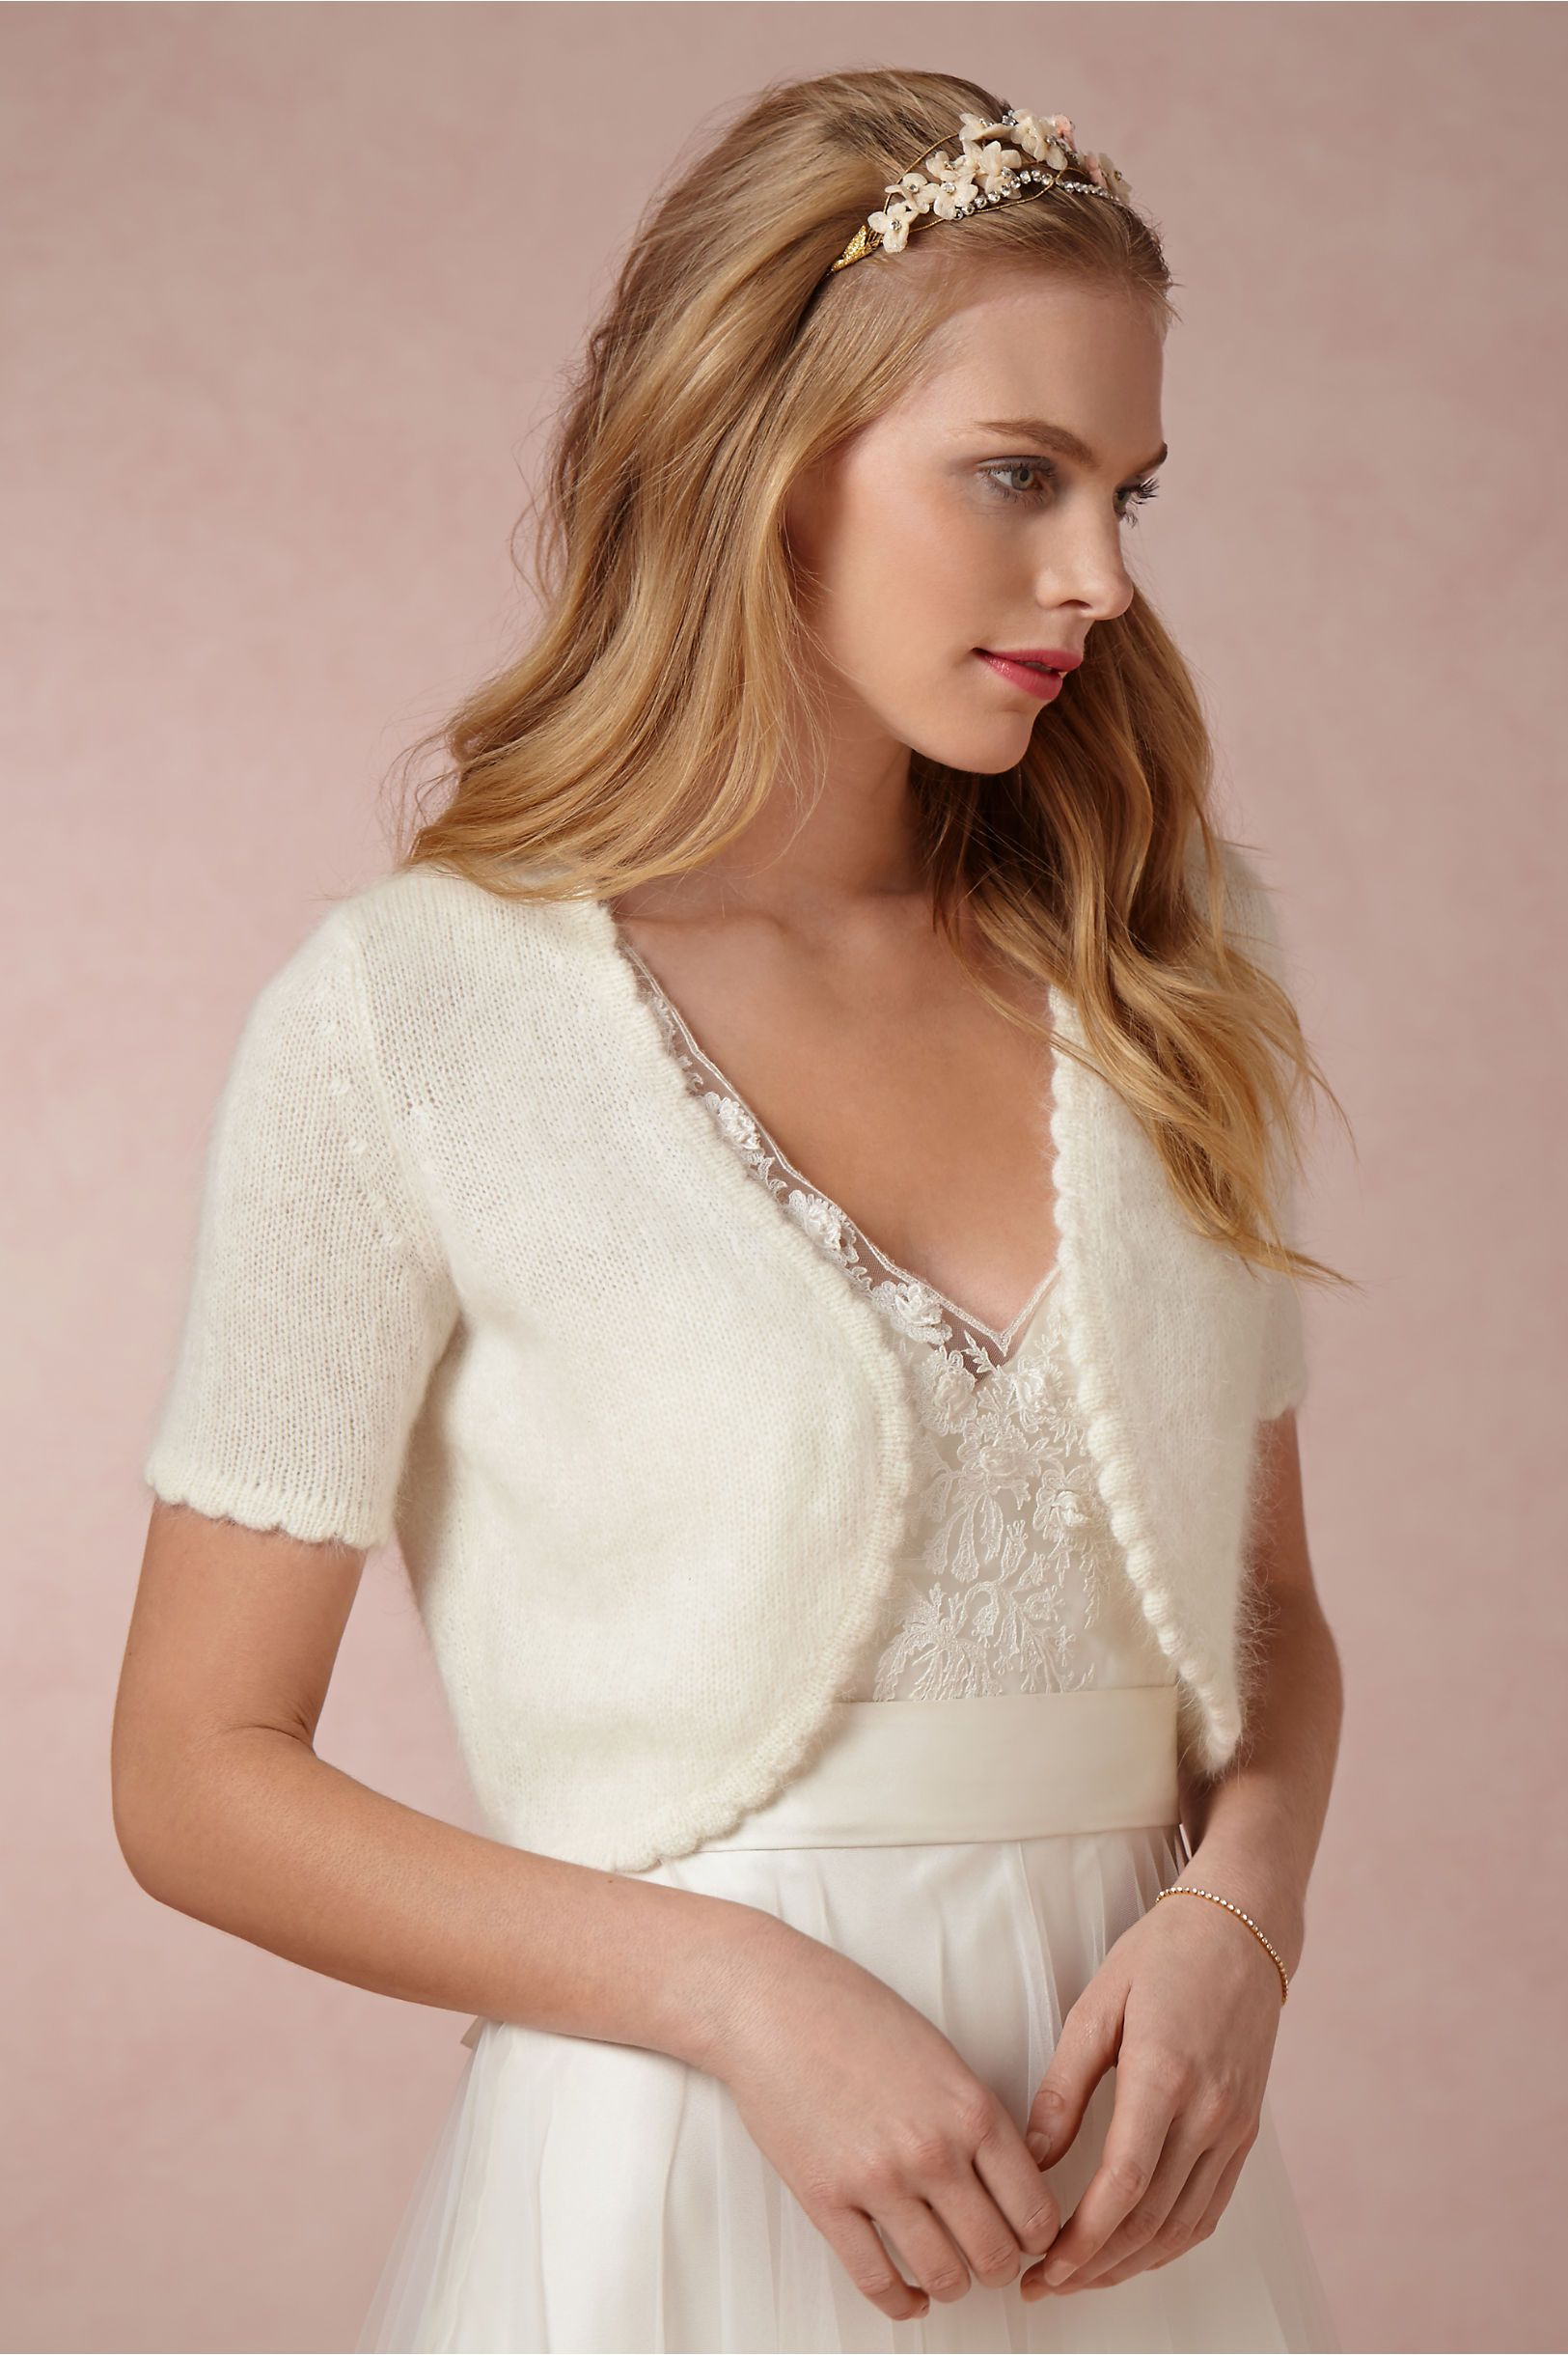 Casual wedding dresses for winter wedding  Plush Angora Topper in Bride Bridal Cover Ups  Wedding  Pinterest